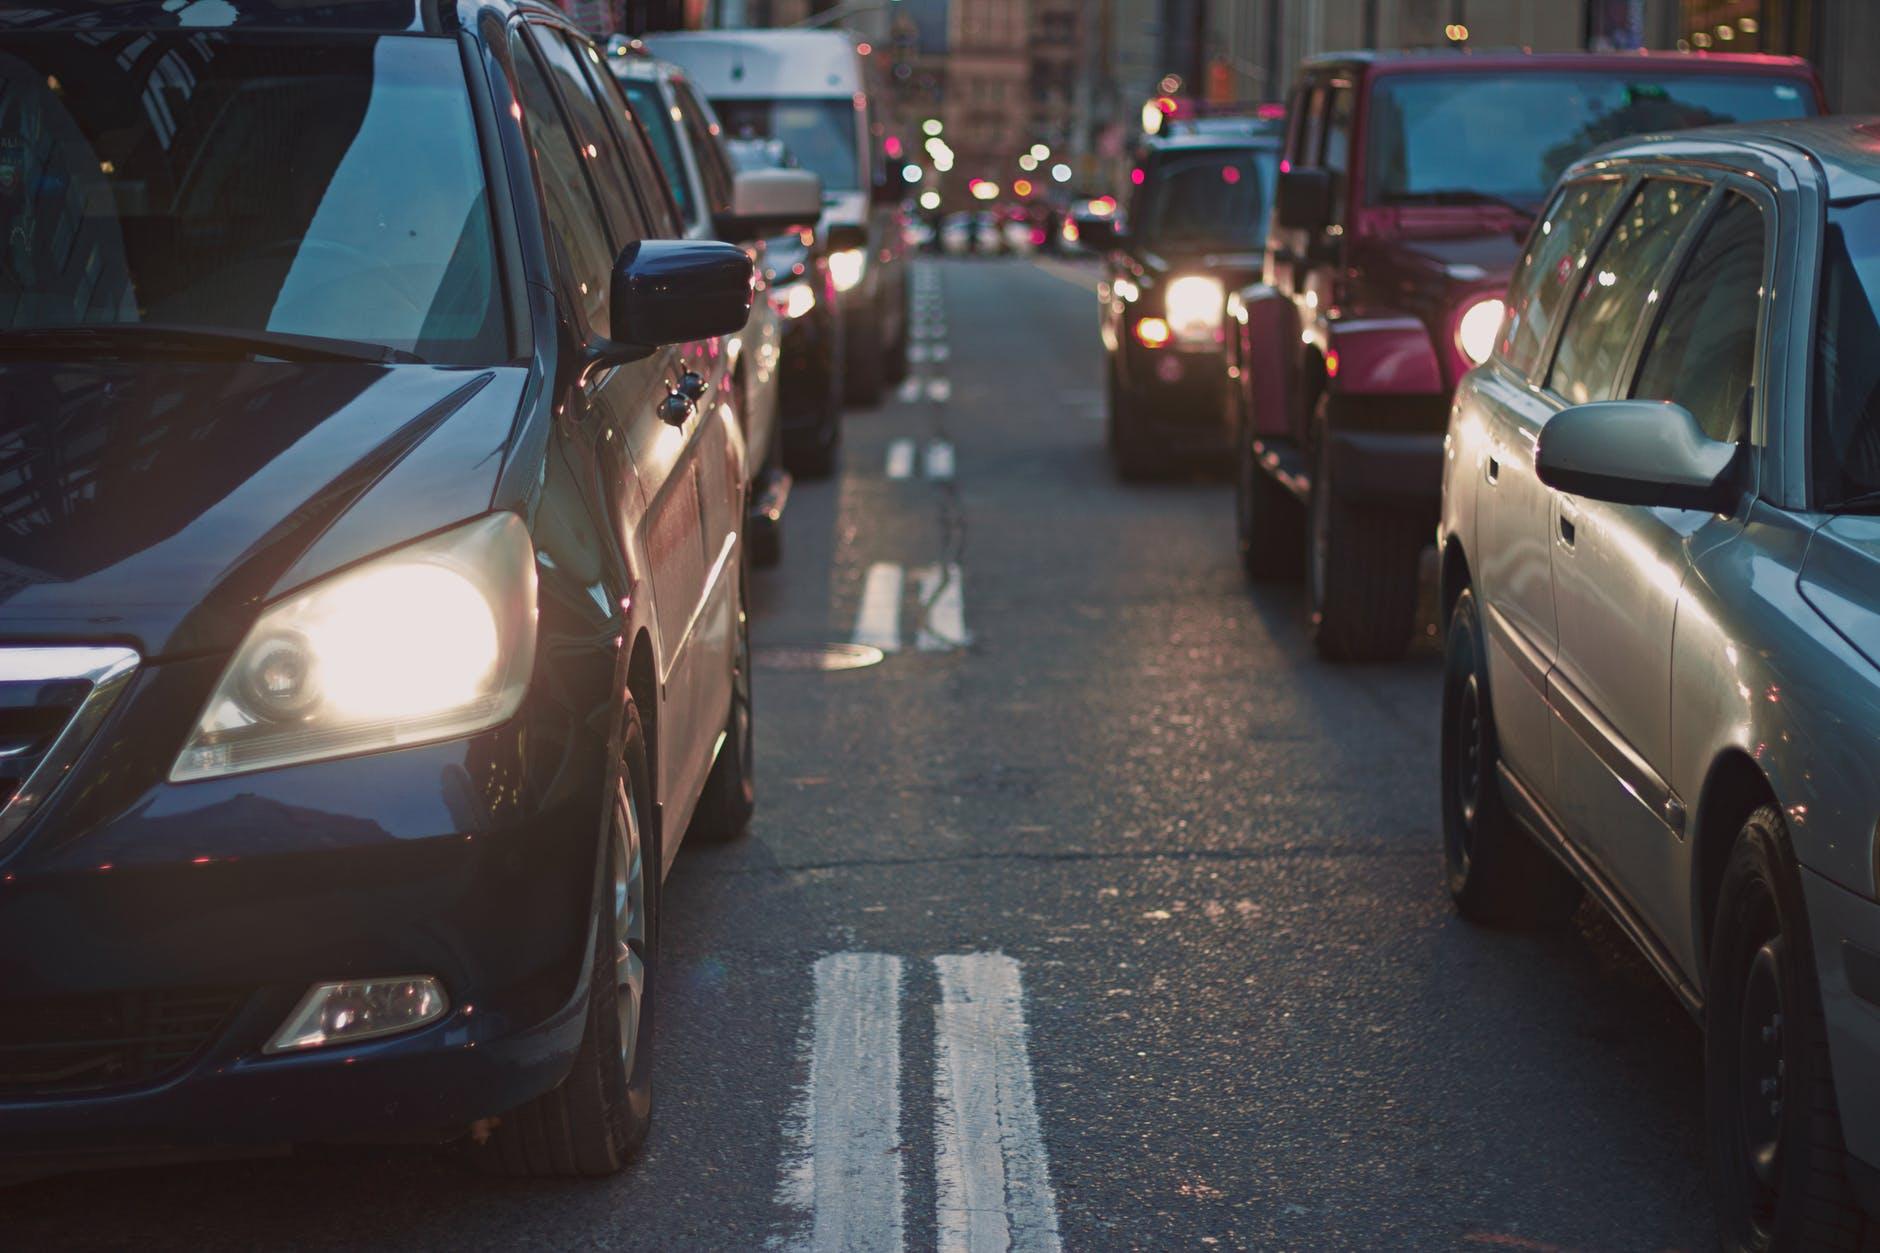 Janesville, WI - Injury Accident At Ravine St & N Washington St